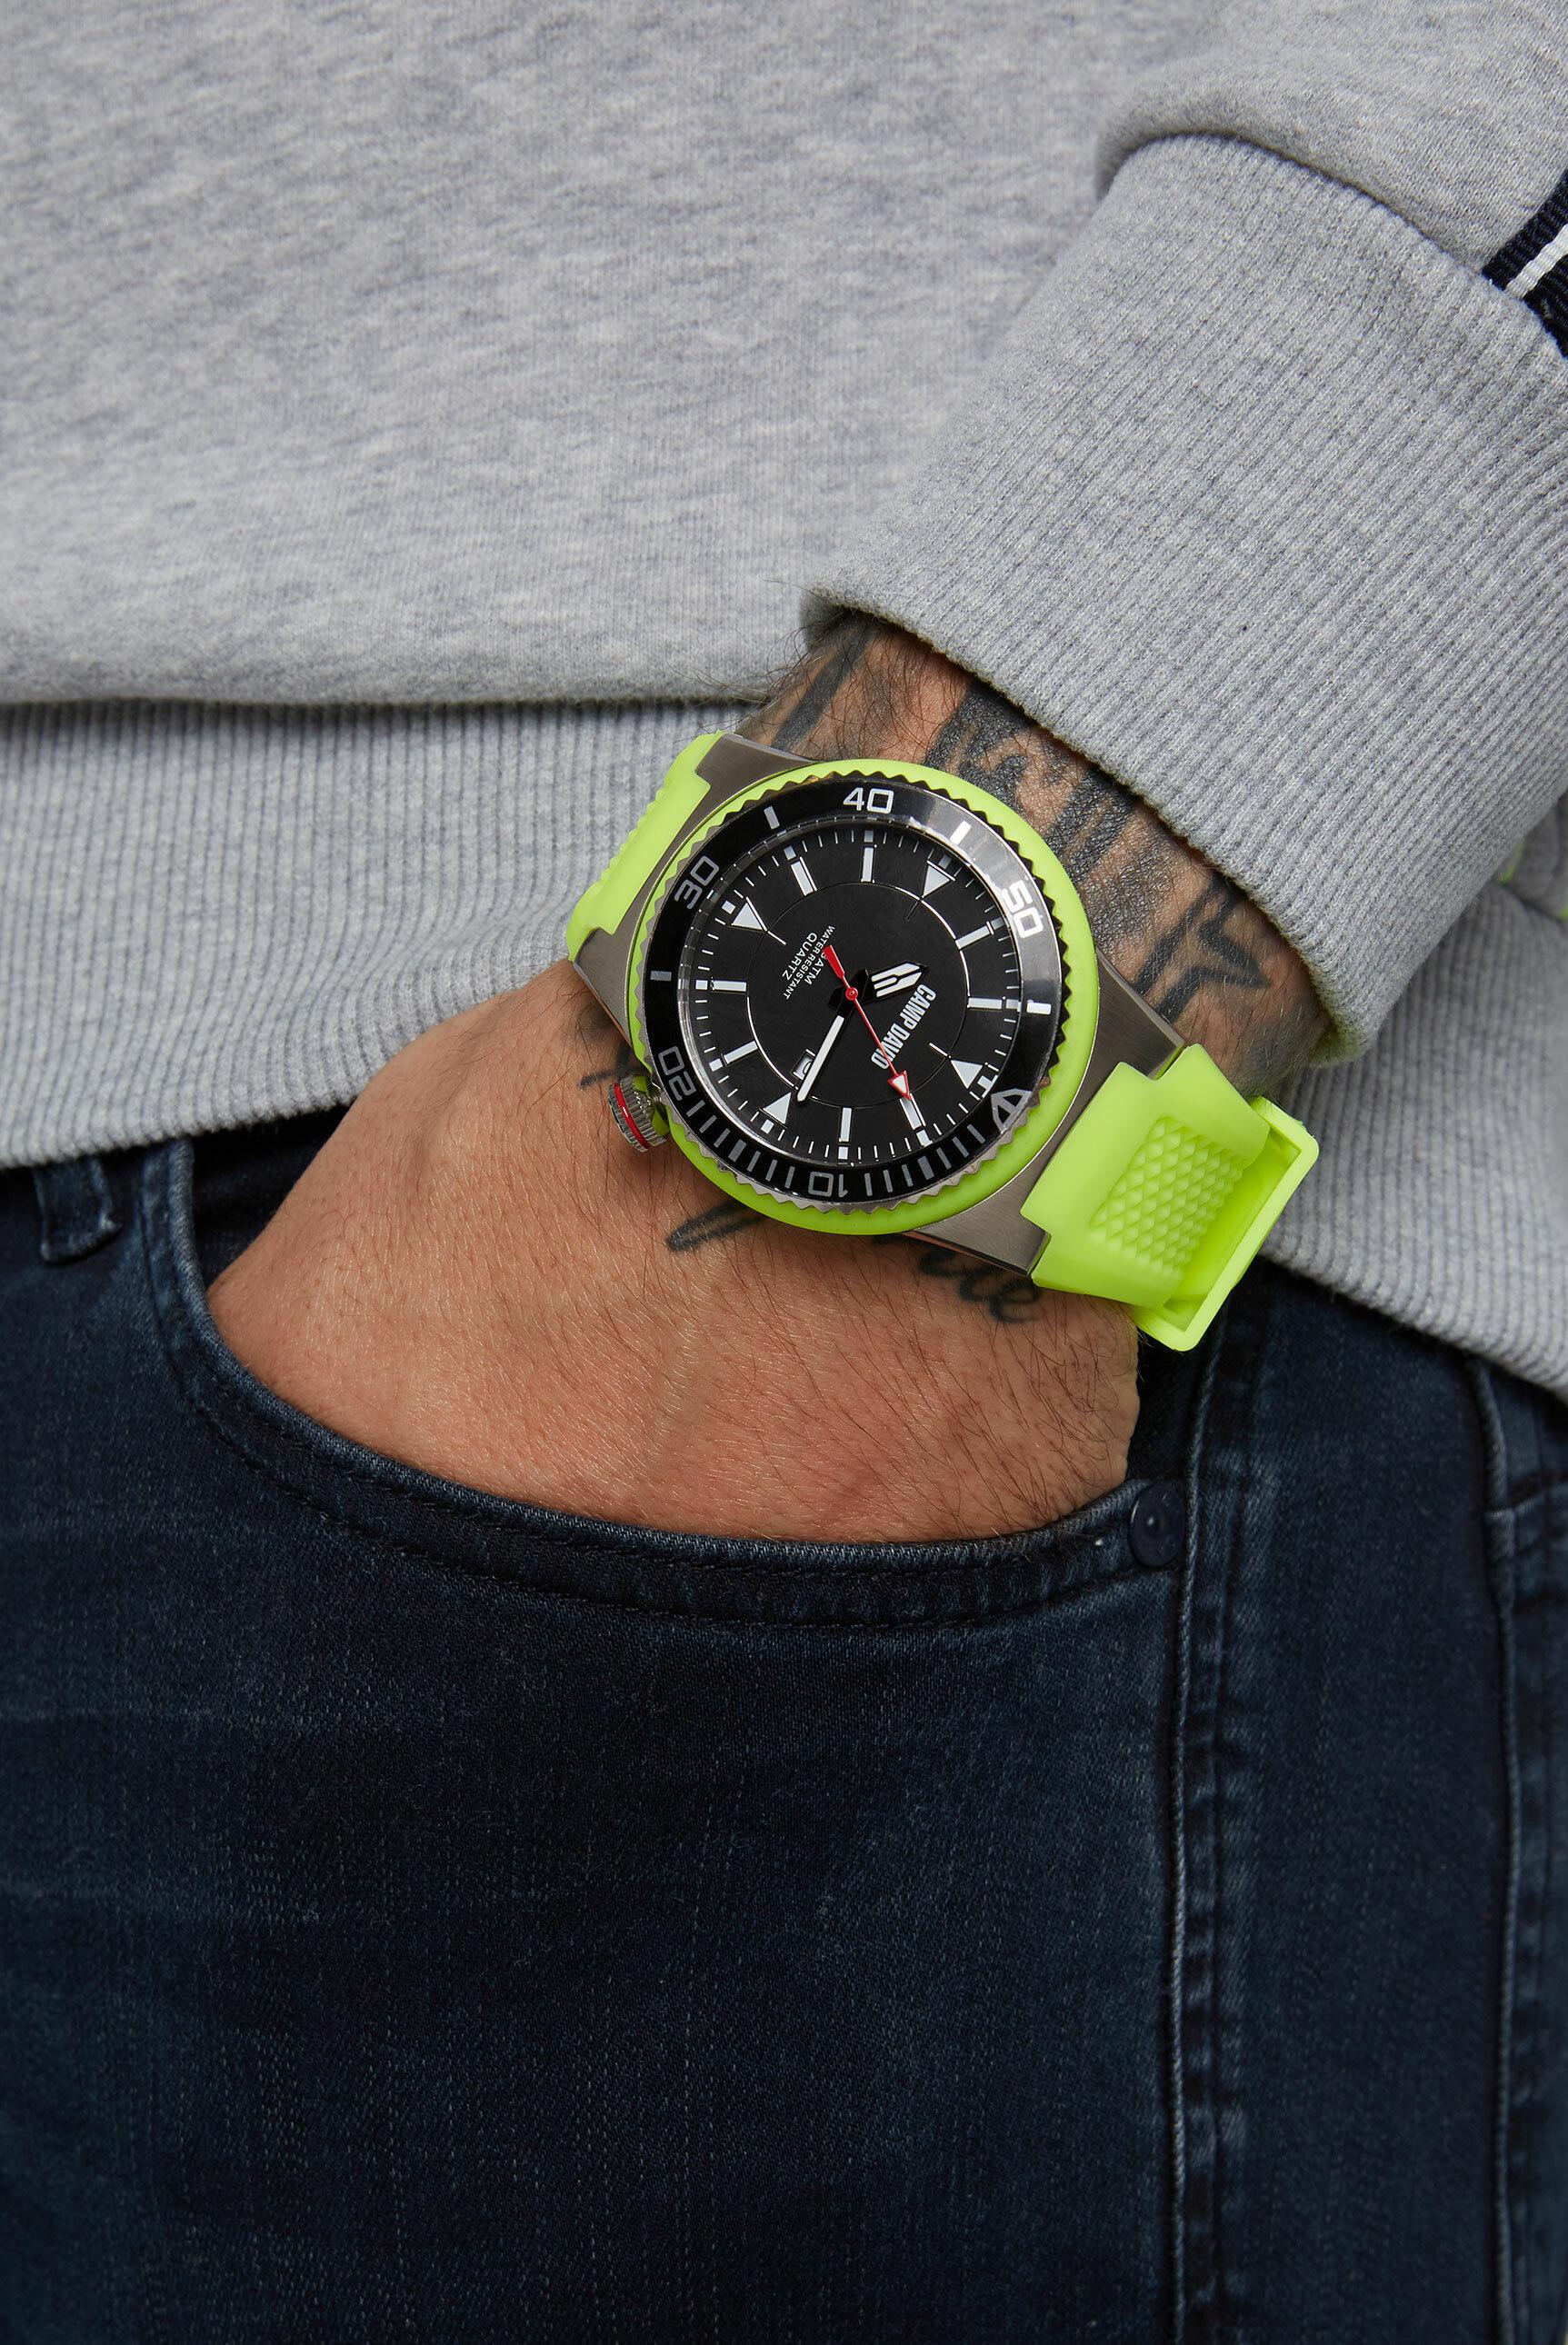 Uhr mit Tauchlünette und Silikonarmband